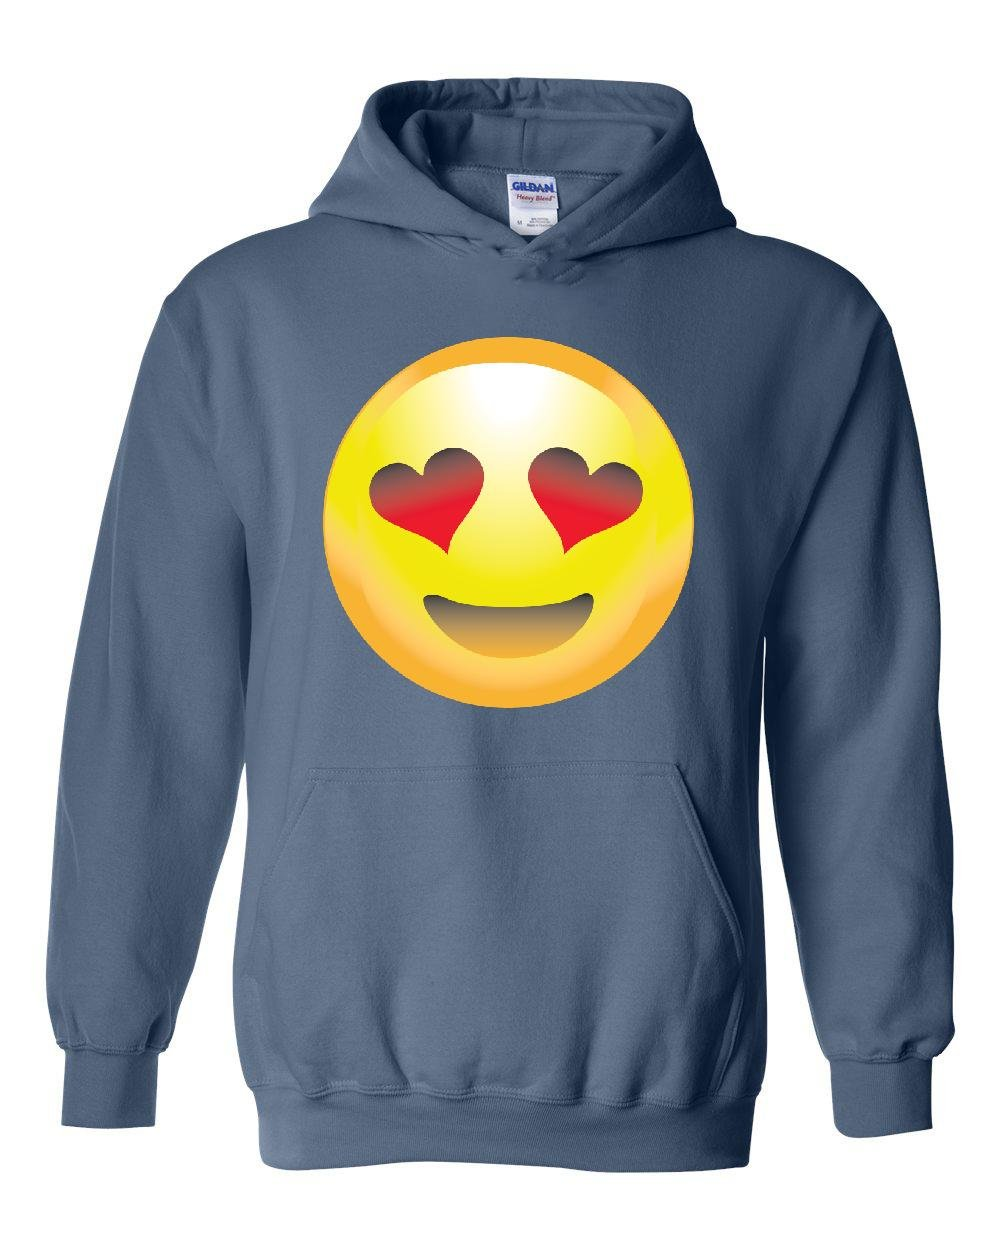 21927ad7aa5e Amazon.com  NIB Emoji Smiling Face w Heart-Shaped Eyes Unisex Hoodie Hooded  Sweatshirt  Clothing